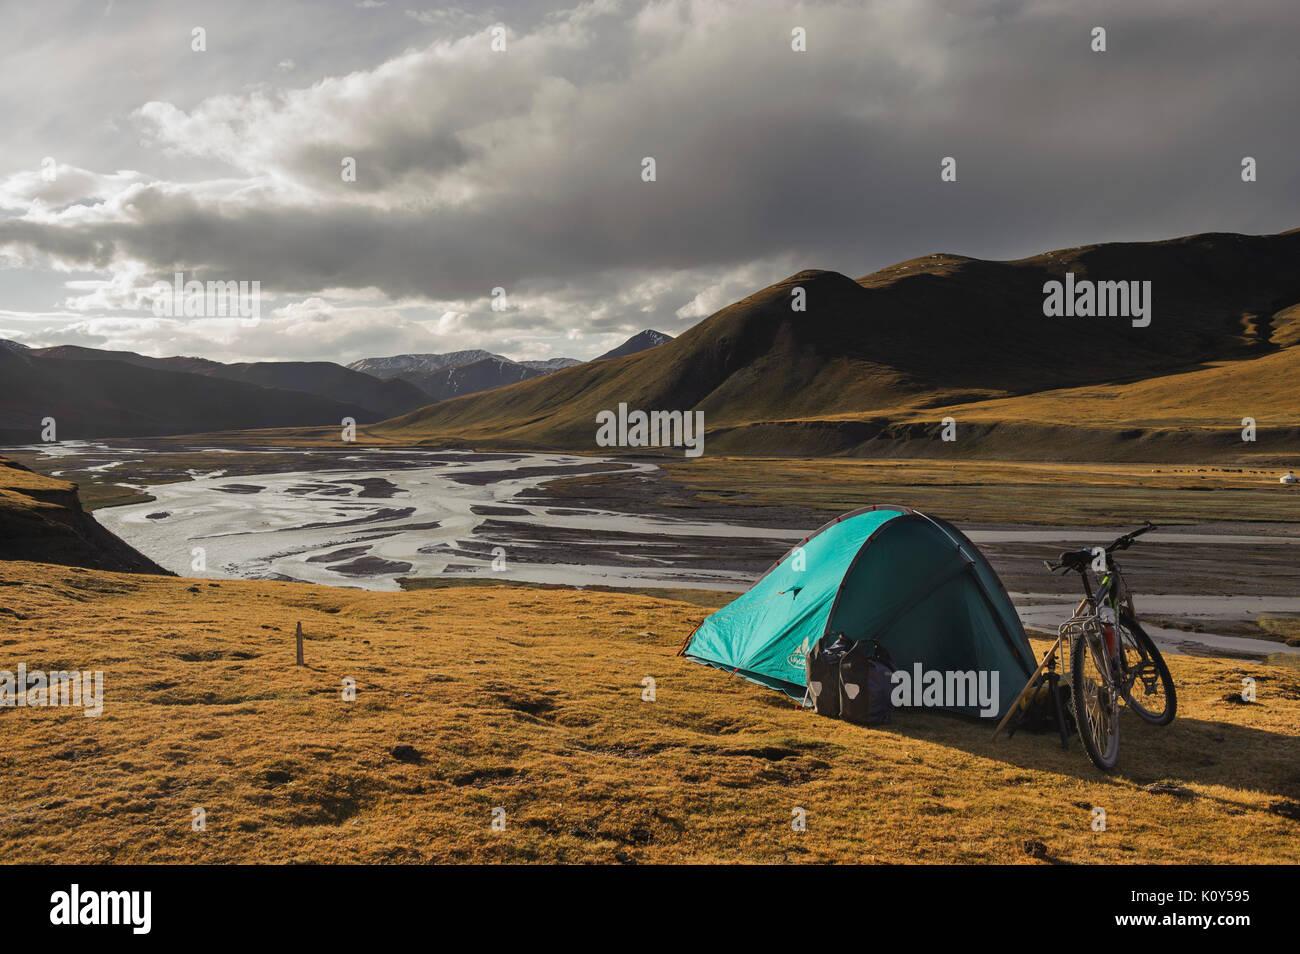 Cycling on the Tibetan plateau - Stock Image